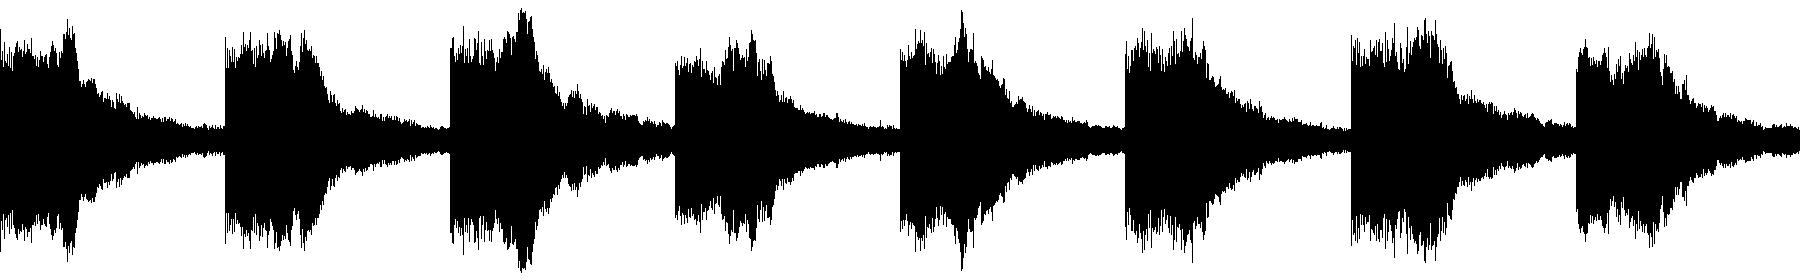 dts chordlp 04b fm wet